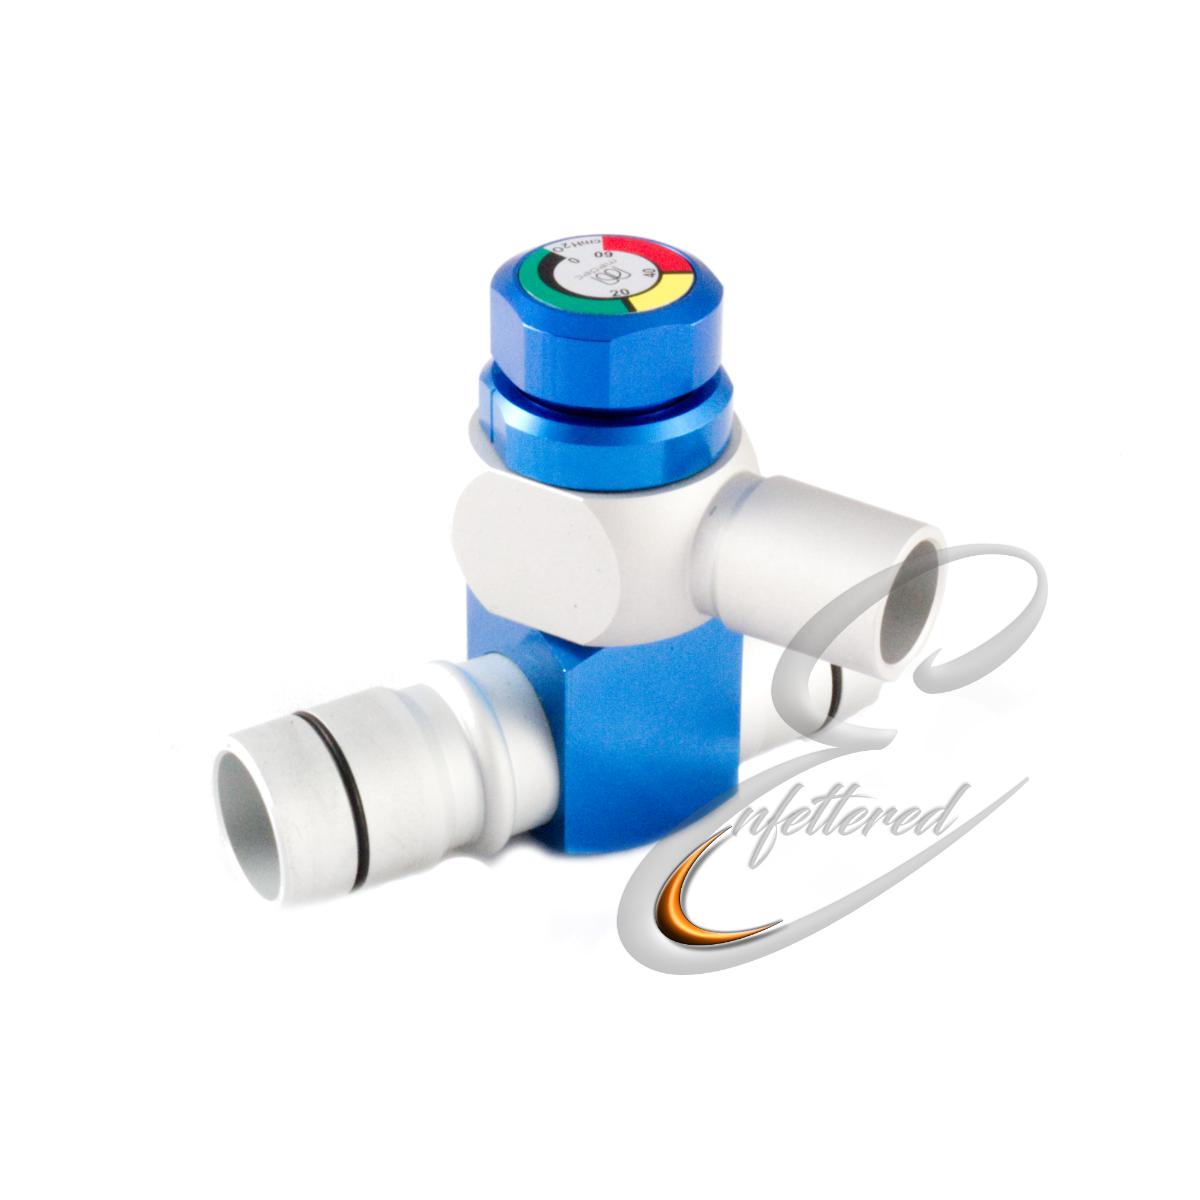 Enfettered Reusable Magill Respiratory Valve